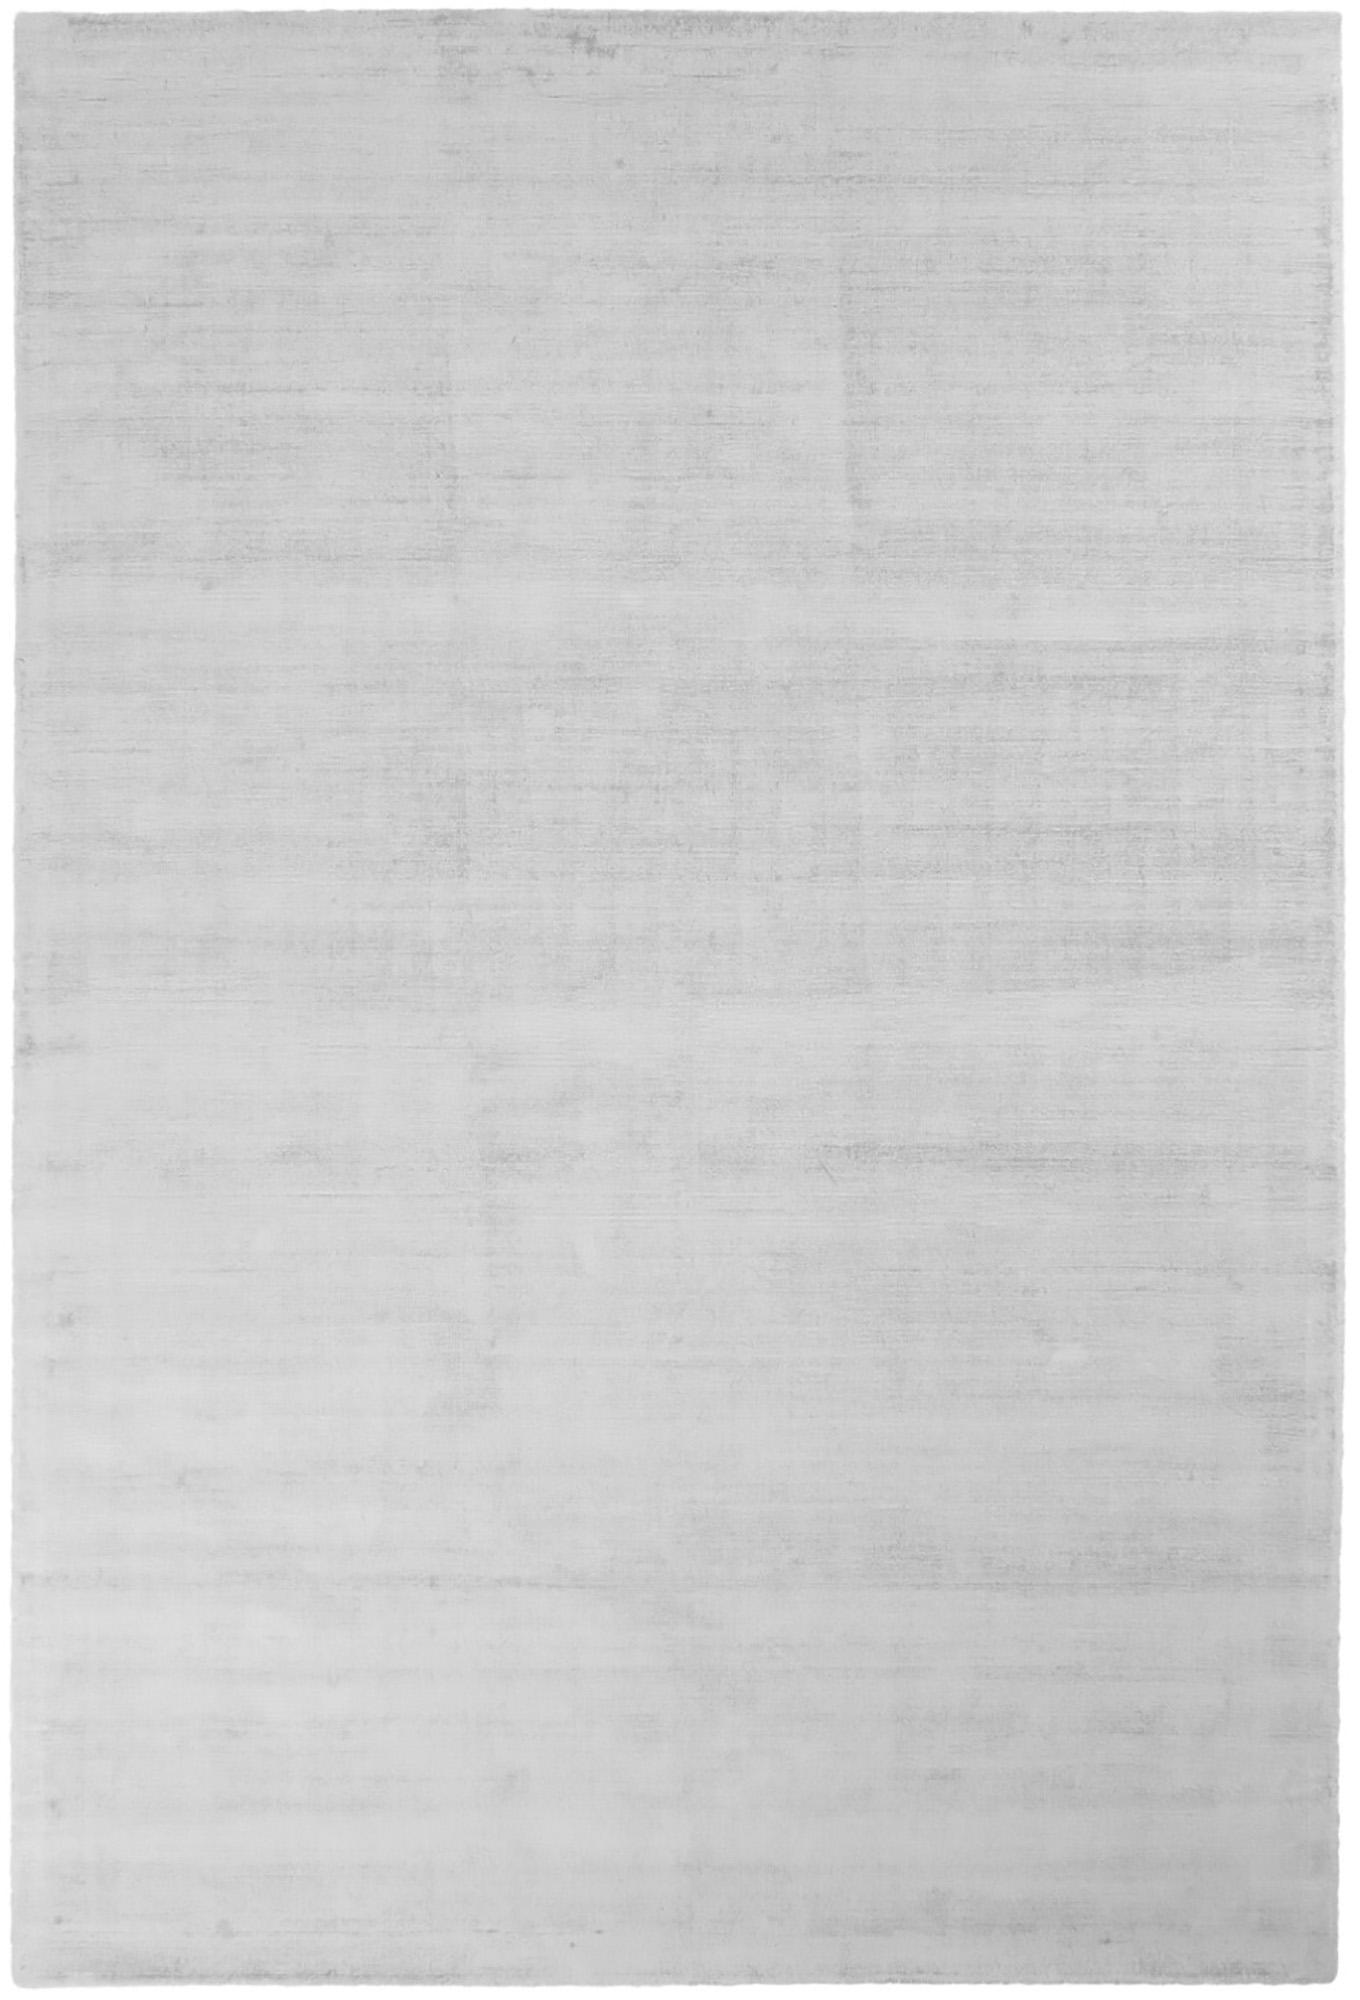 Handgewebter Viskoseteppich Jane in Silbergrau, Flor: 100% Viskose, Silbergrau, B 200 x L 300 cm (Größe L)